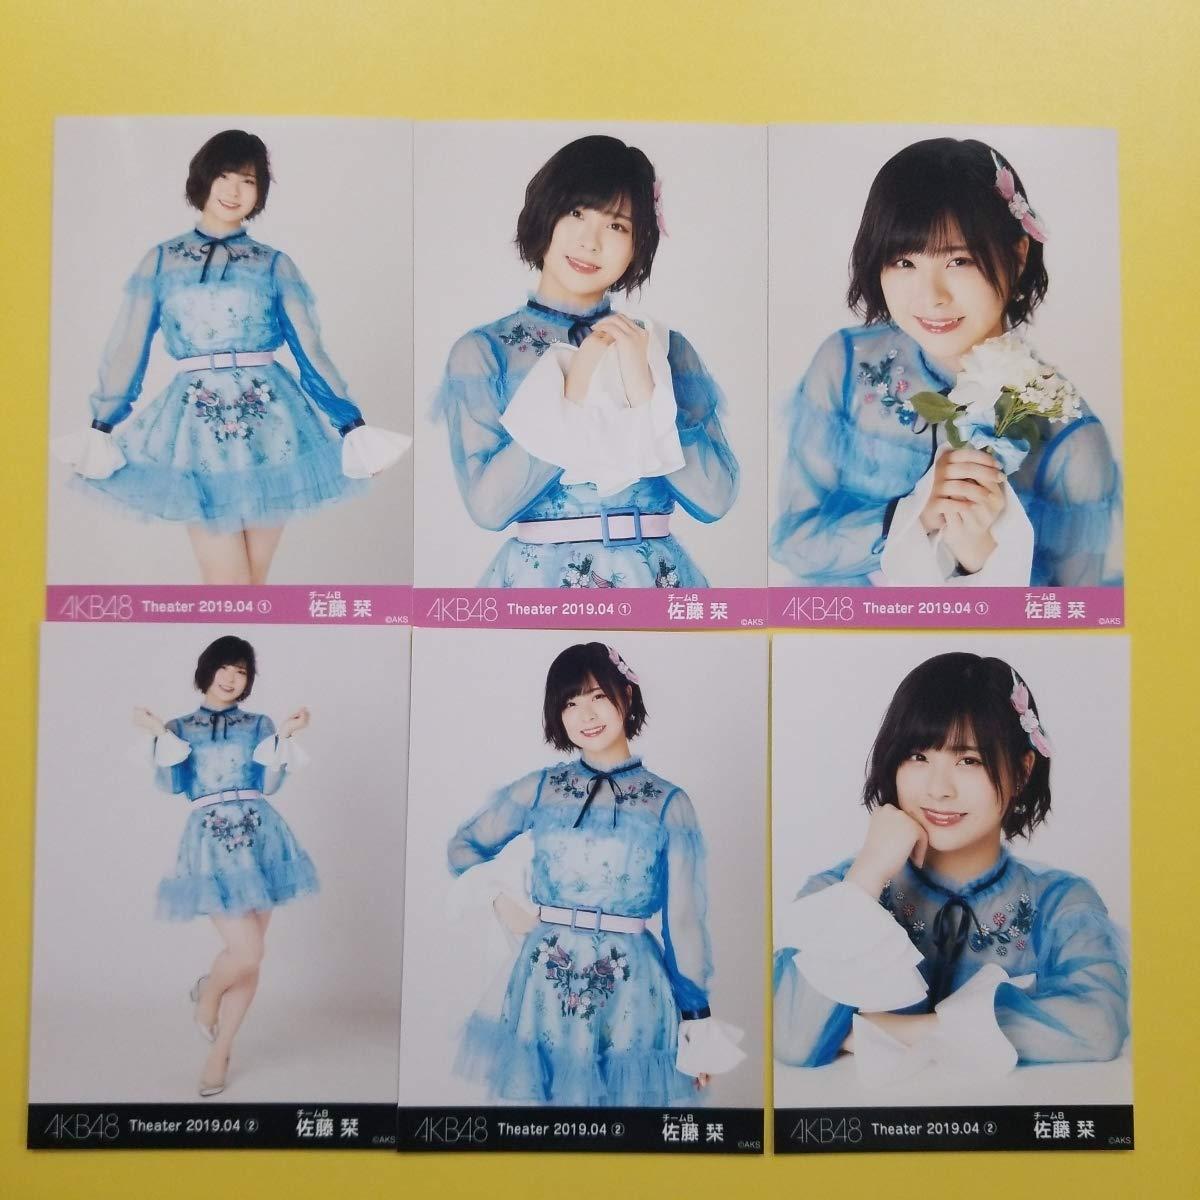 AKB48 チーム8 佐藤栞 月別生写真 2019 4月 April ①+② 6種コンプ   B07QFNFR74